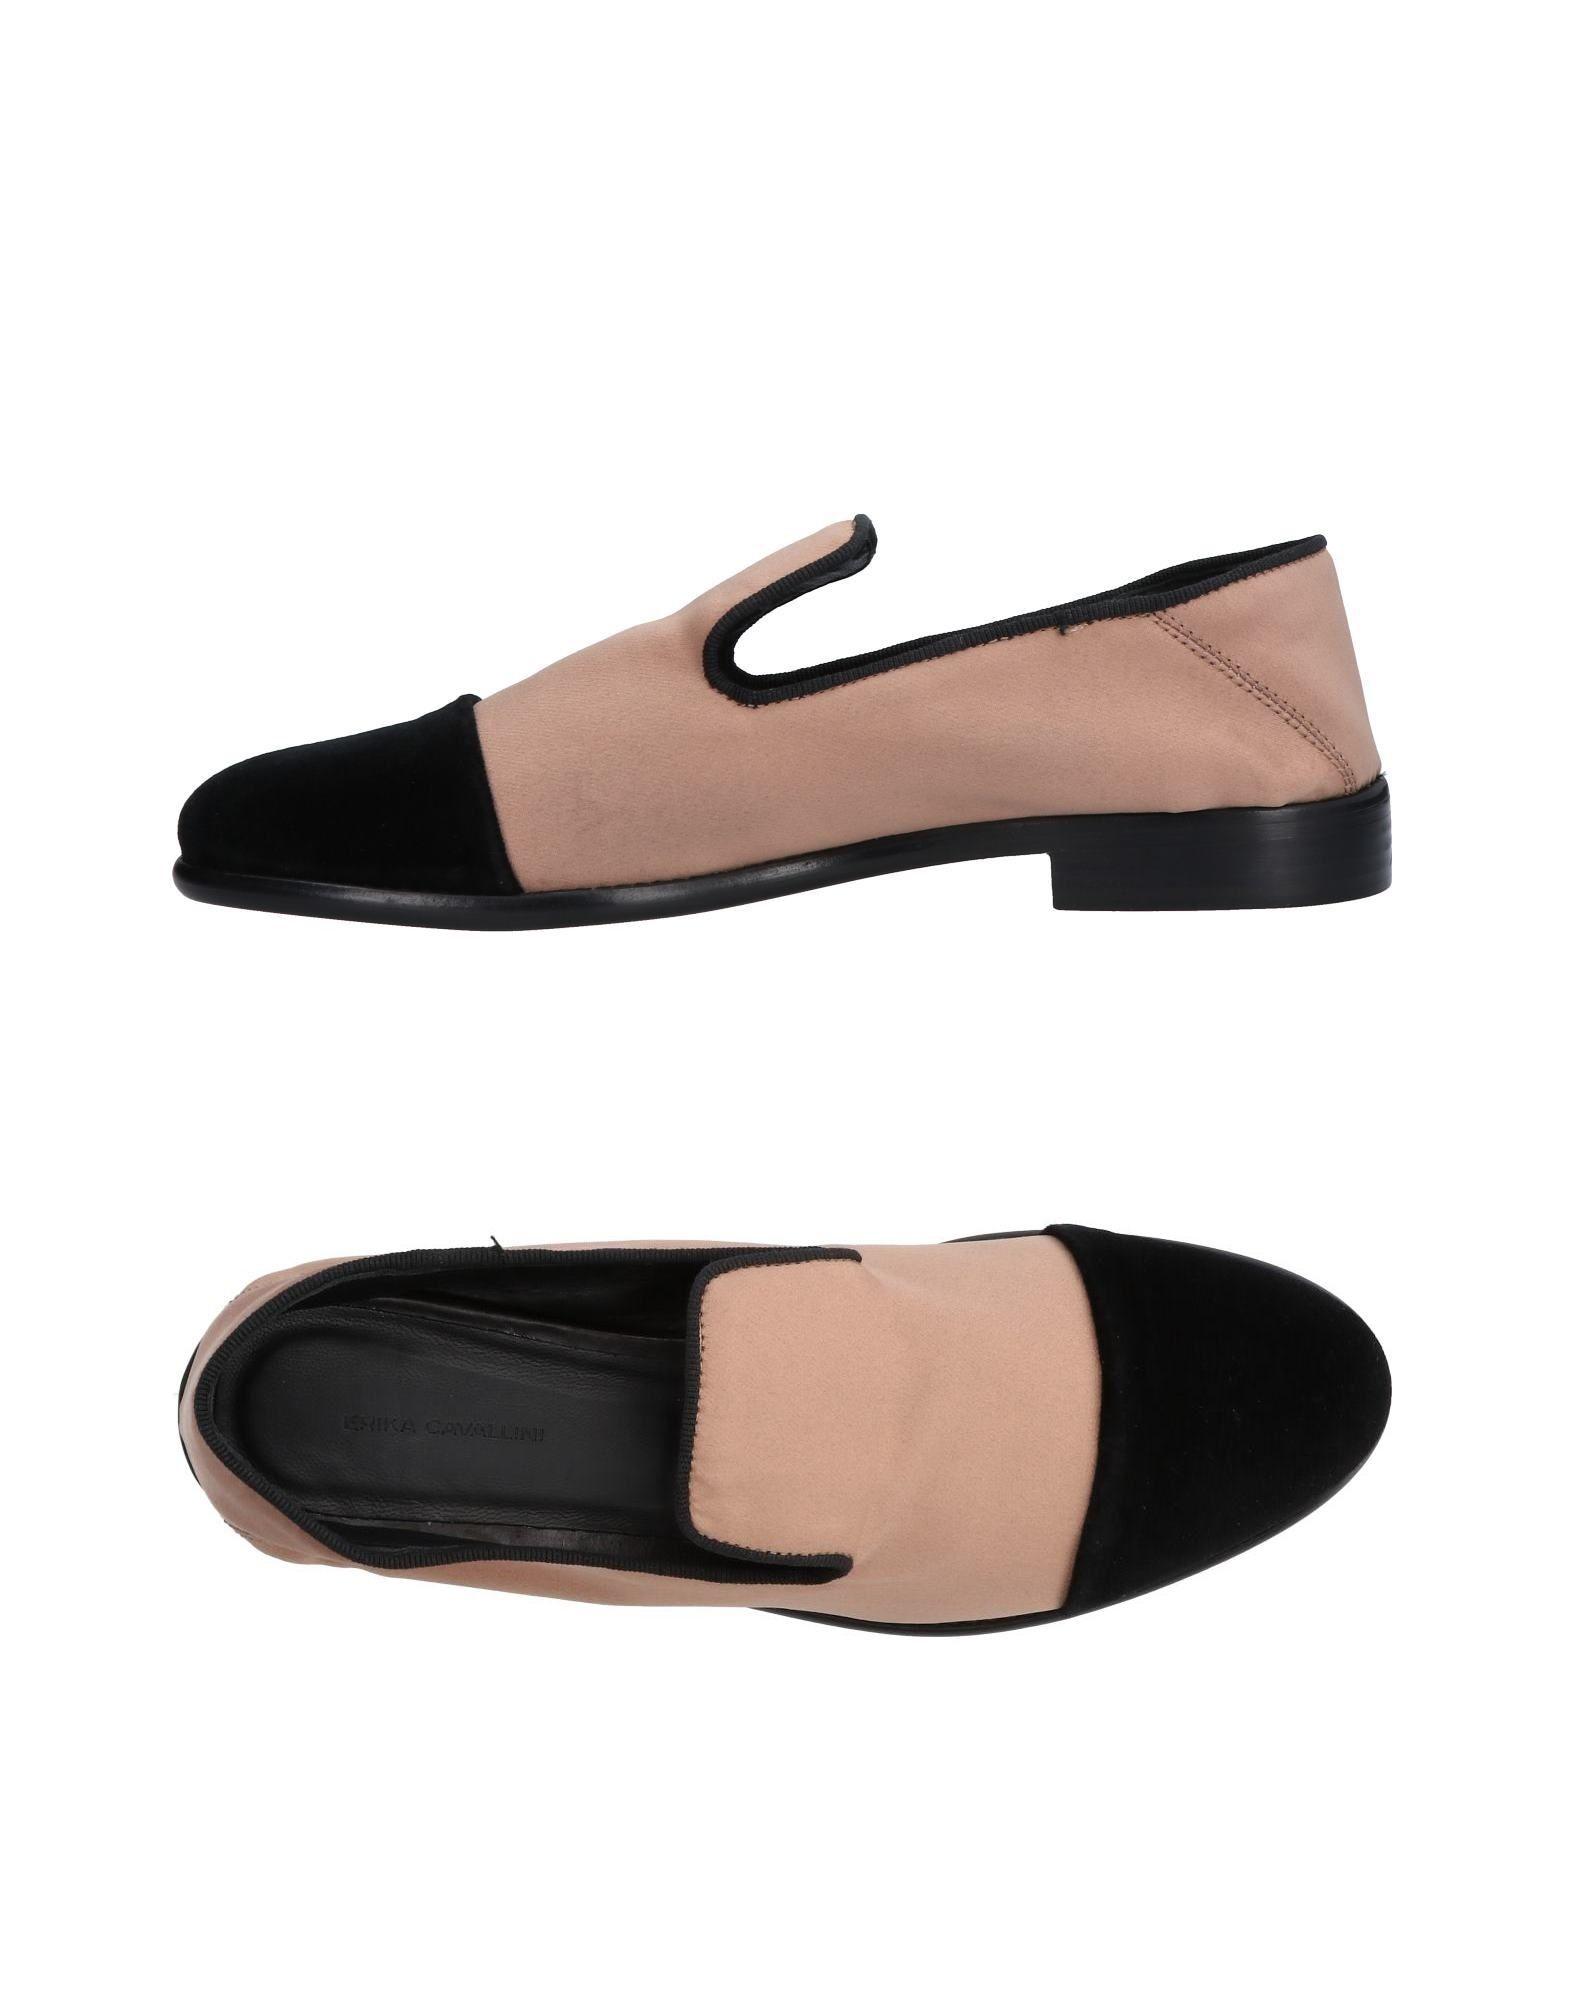 Erika Cavallini Mokassins Damen  11448465GLGut aussehende strapazierfähige Schuhe